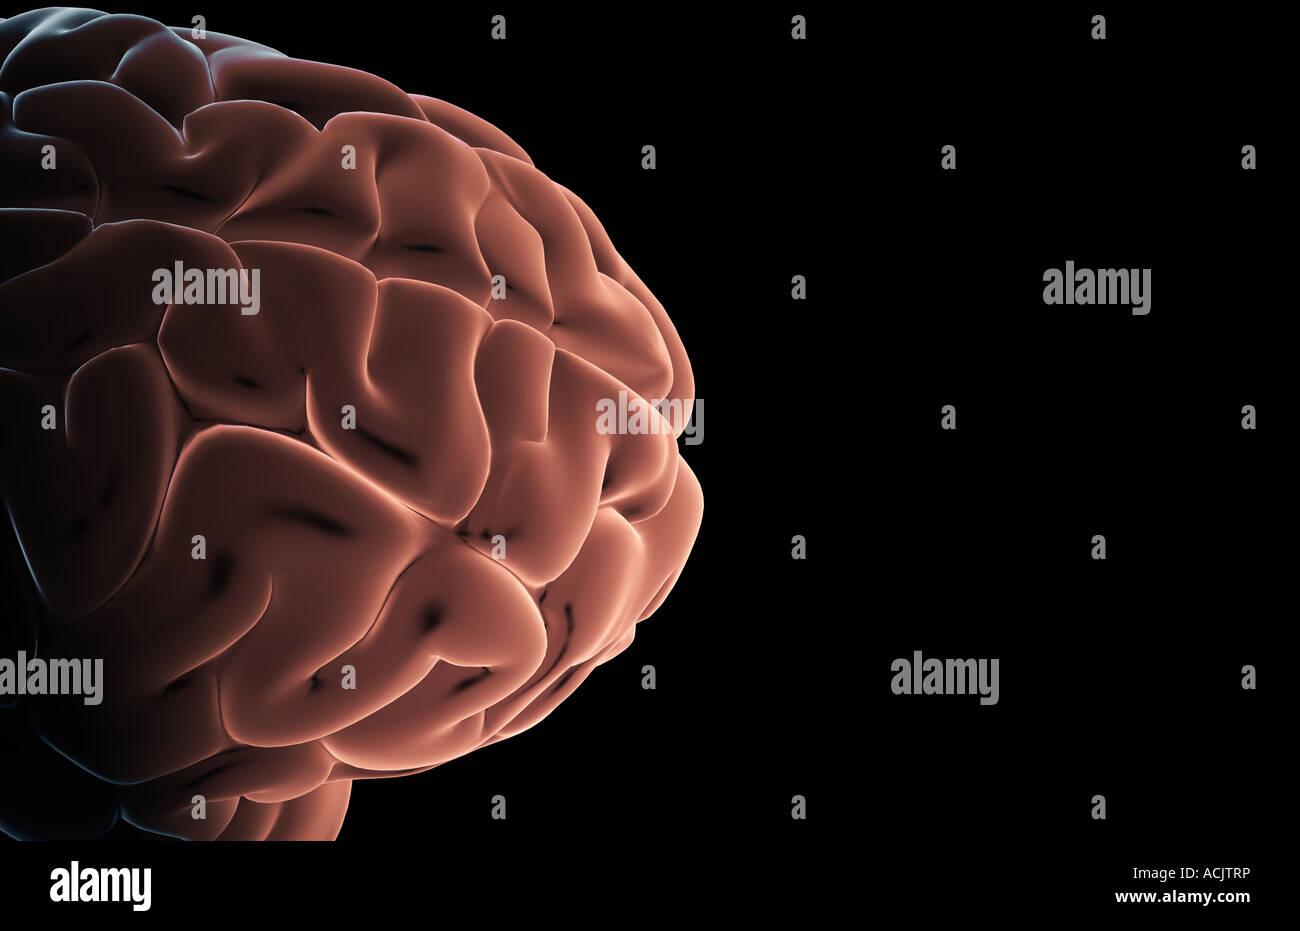 Frontal Lobe Stock Photos & Frontal Lobe Stock Images - Alamy